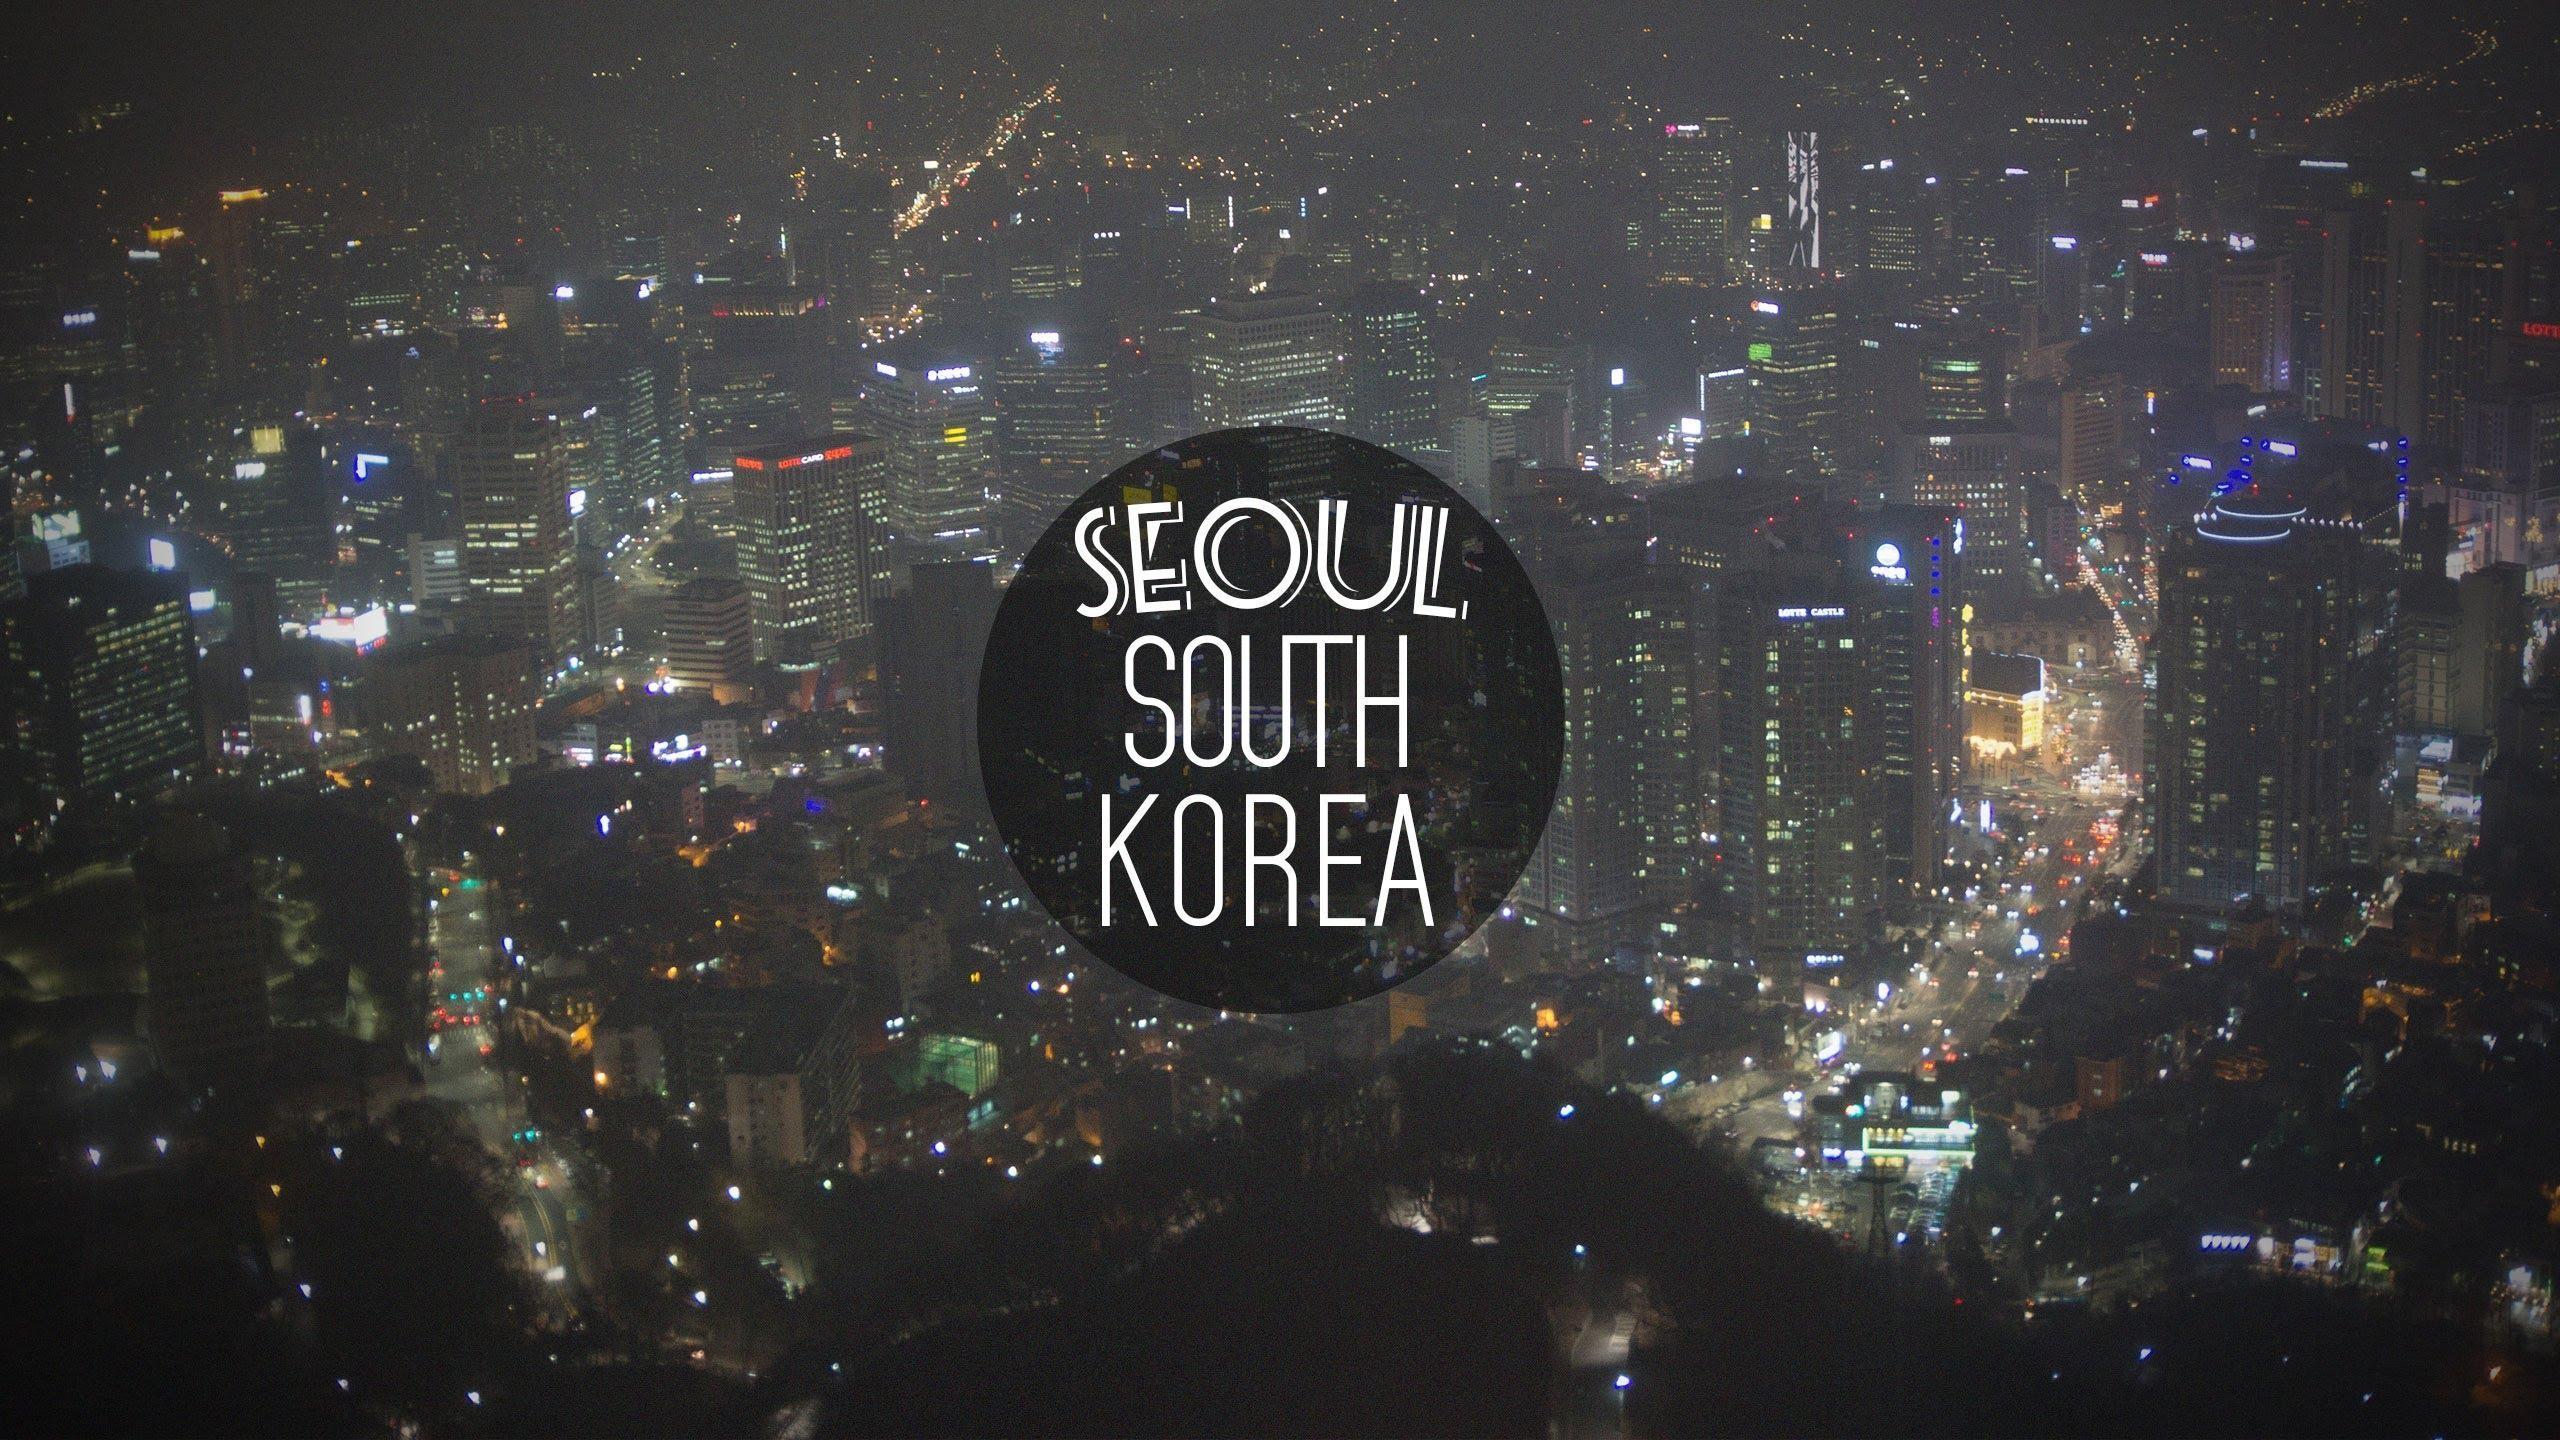 Korea Wallpaper 71 Images